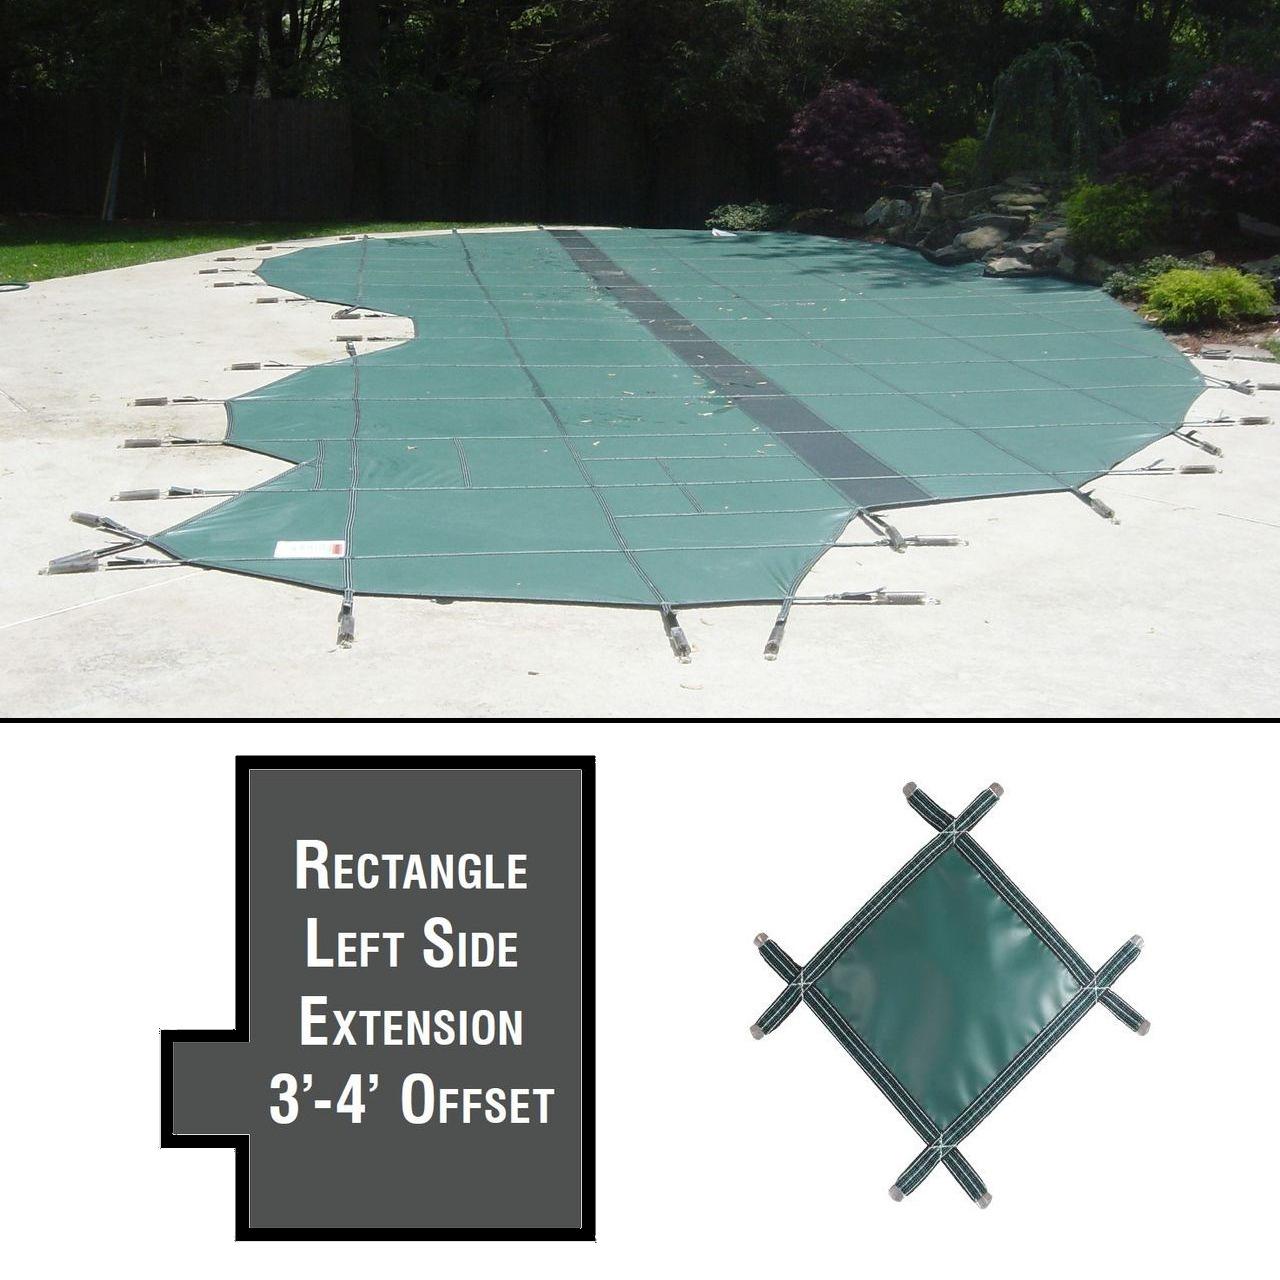 PermaGuard 22'x42' Rectangular Pool Cover Plus Left Ext 3' Offset